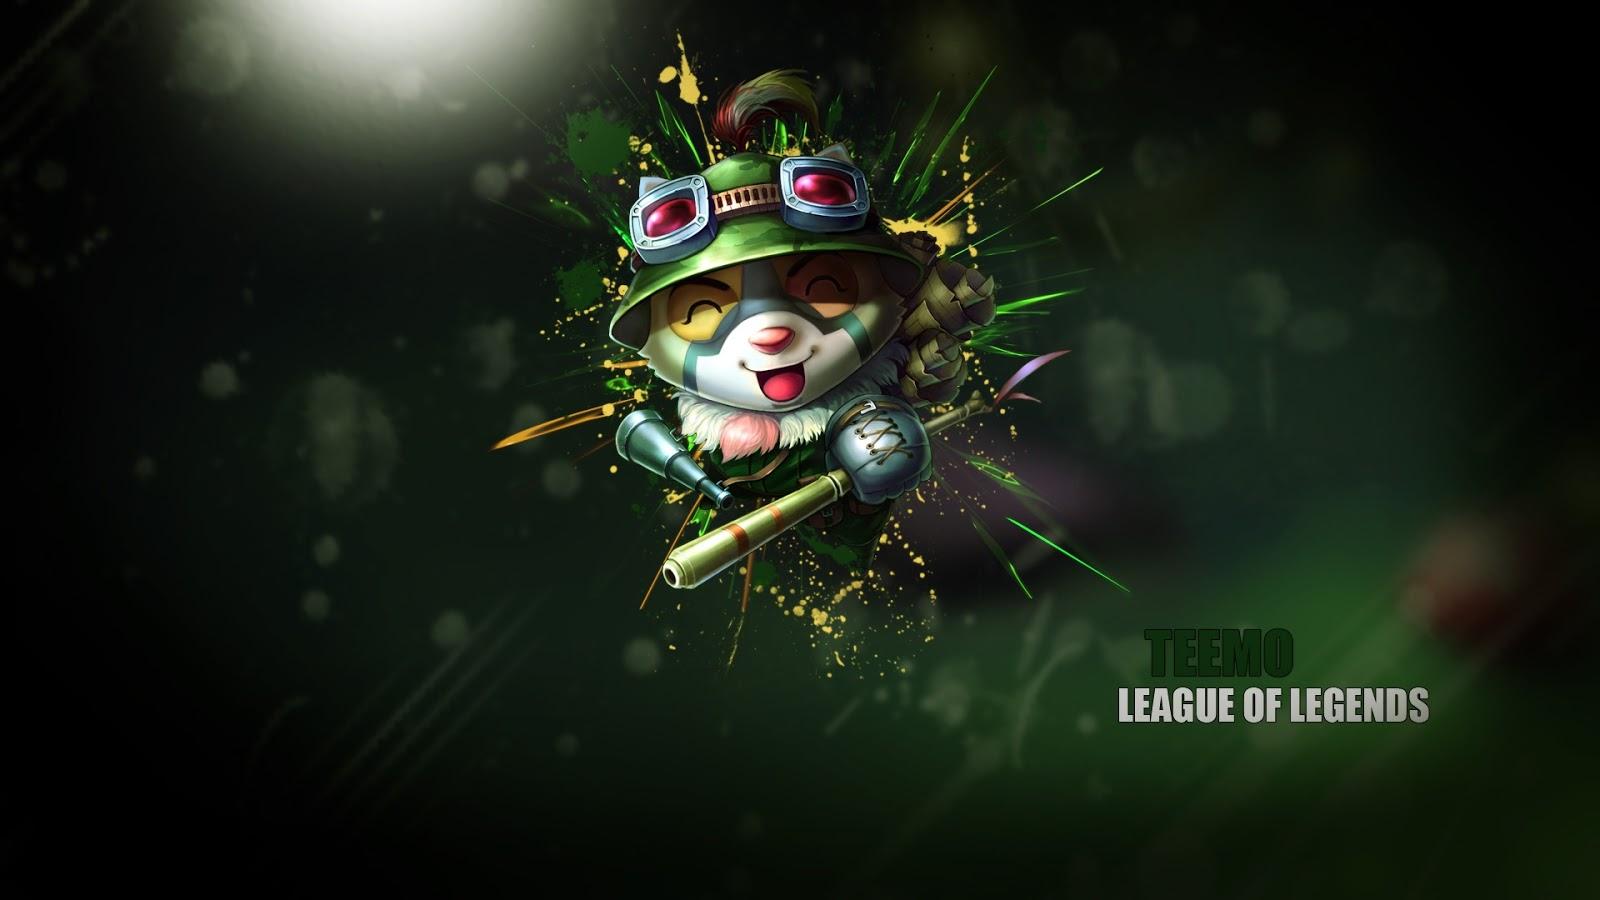 Teemo in League of Legends ~ Mystery Wallpaper